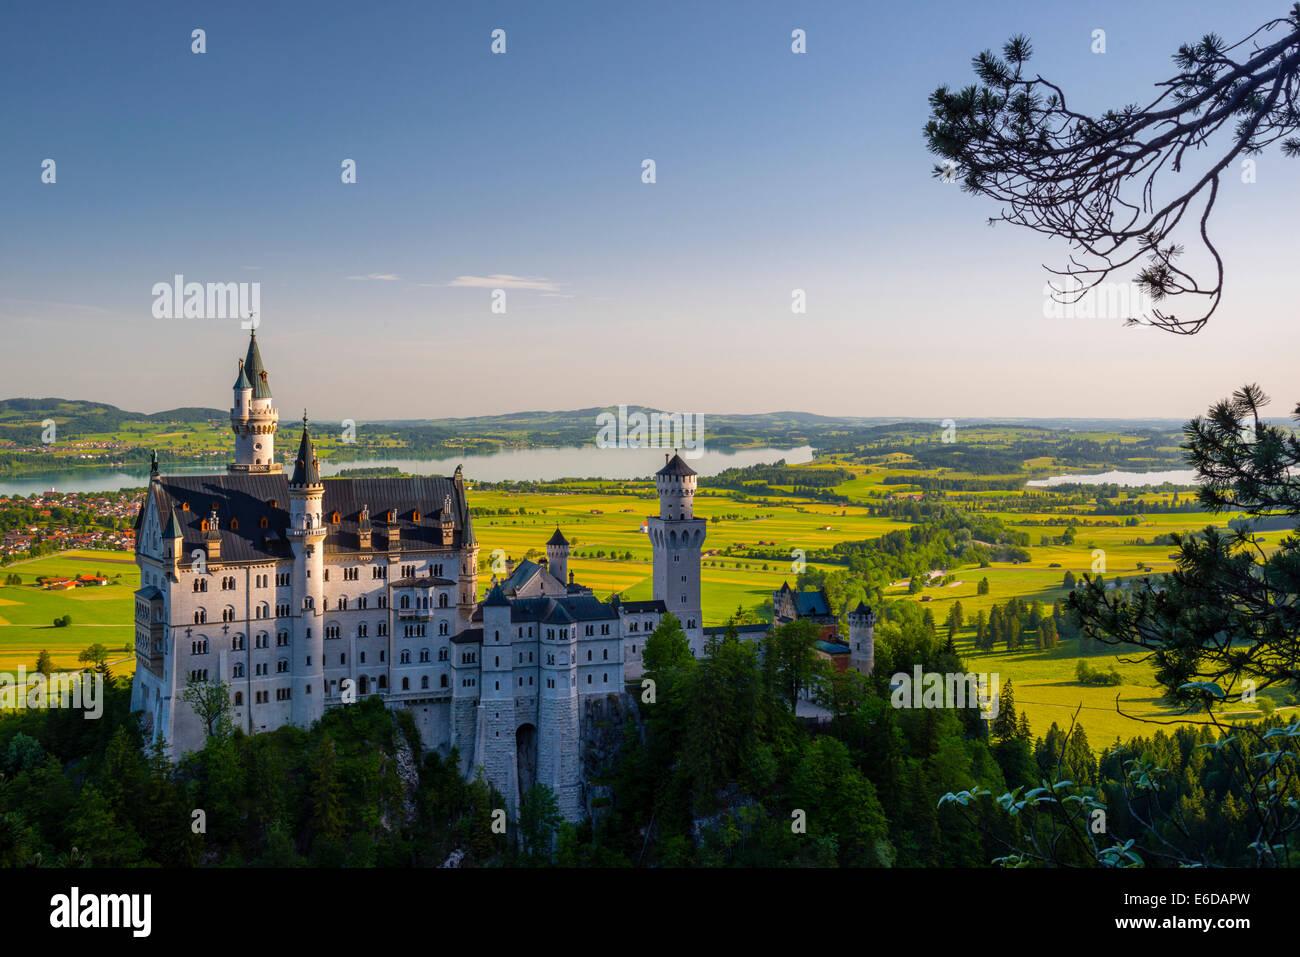 Allemagne, Bavière, souabe, Allgaeu, Schwangau Allgaeu est, Hohenschangau, le château de Neuschwanstein Photo Stock